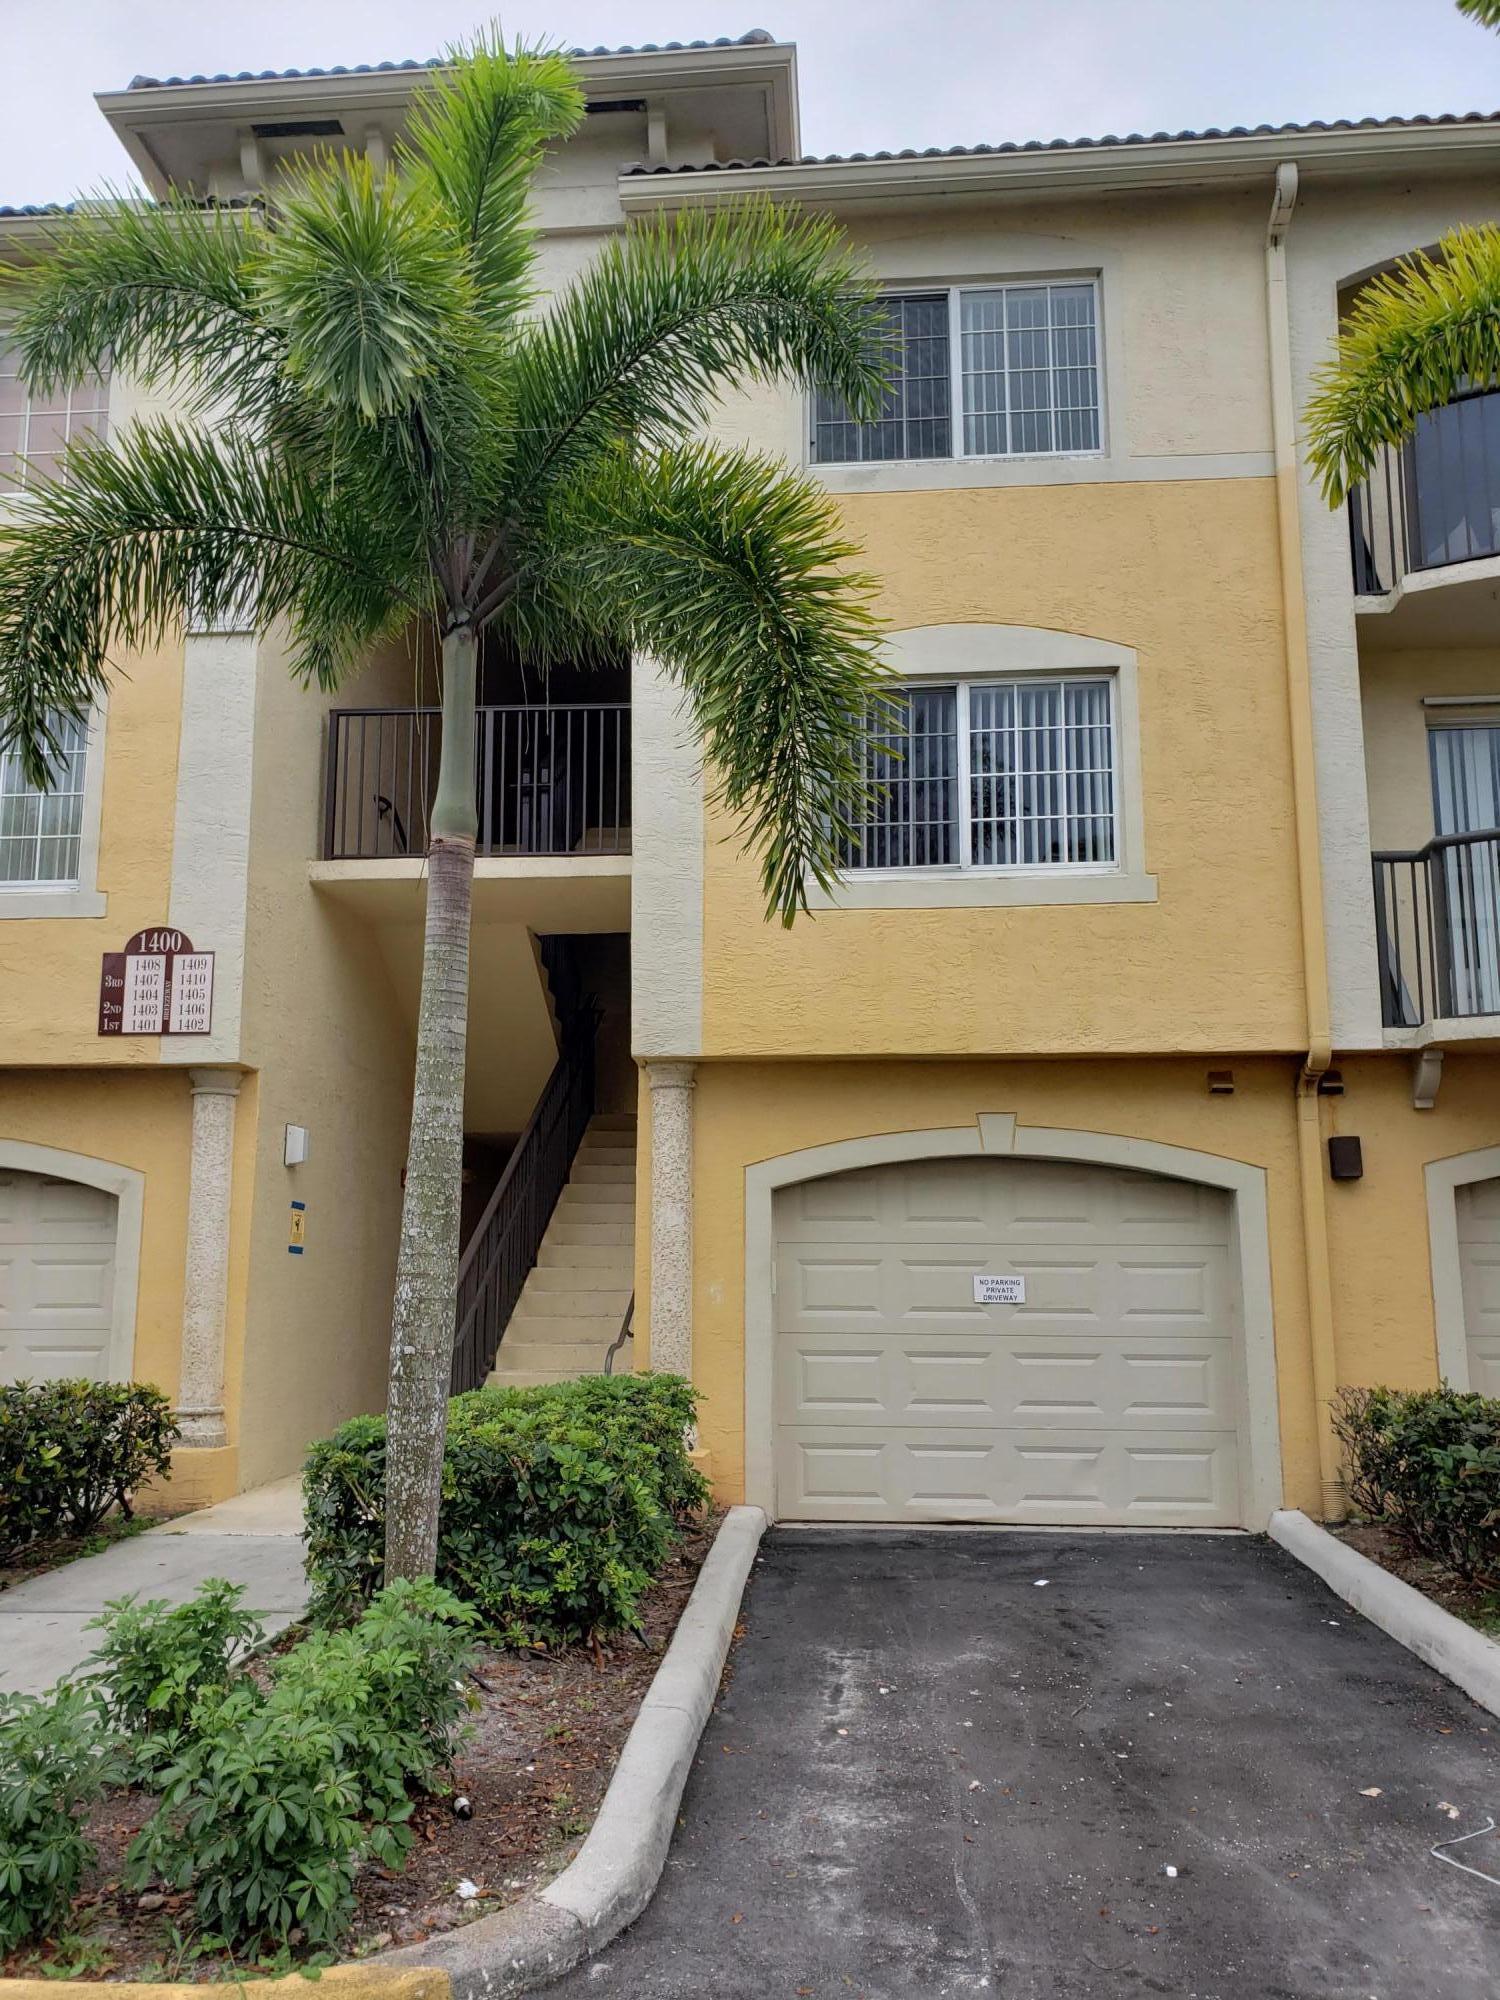 1400 Crestwood Court S, Royal Palm Beach, FL 33411